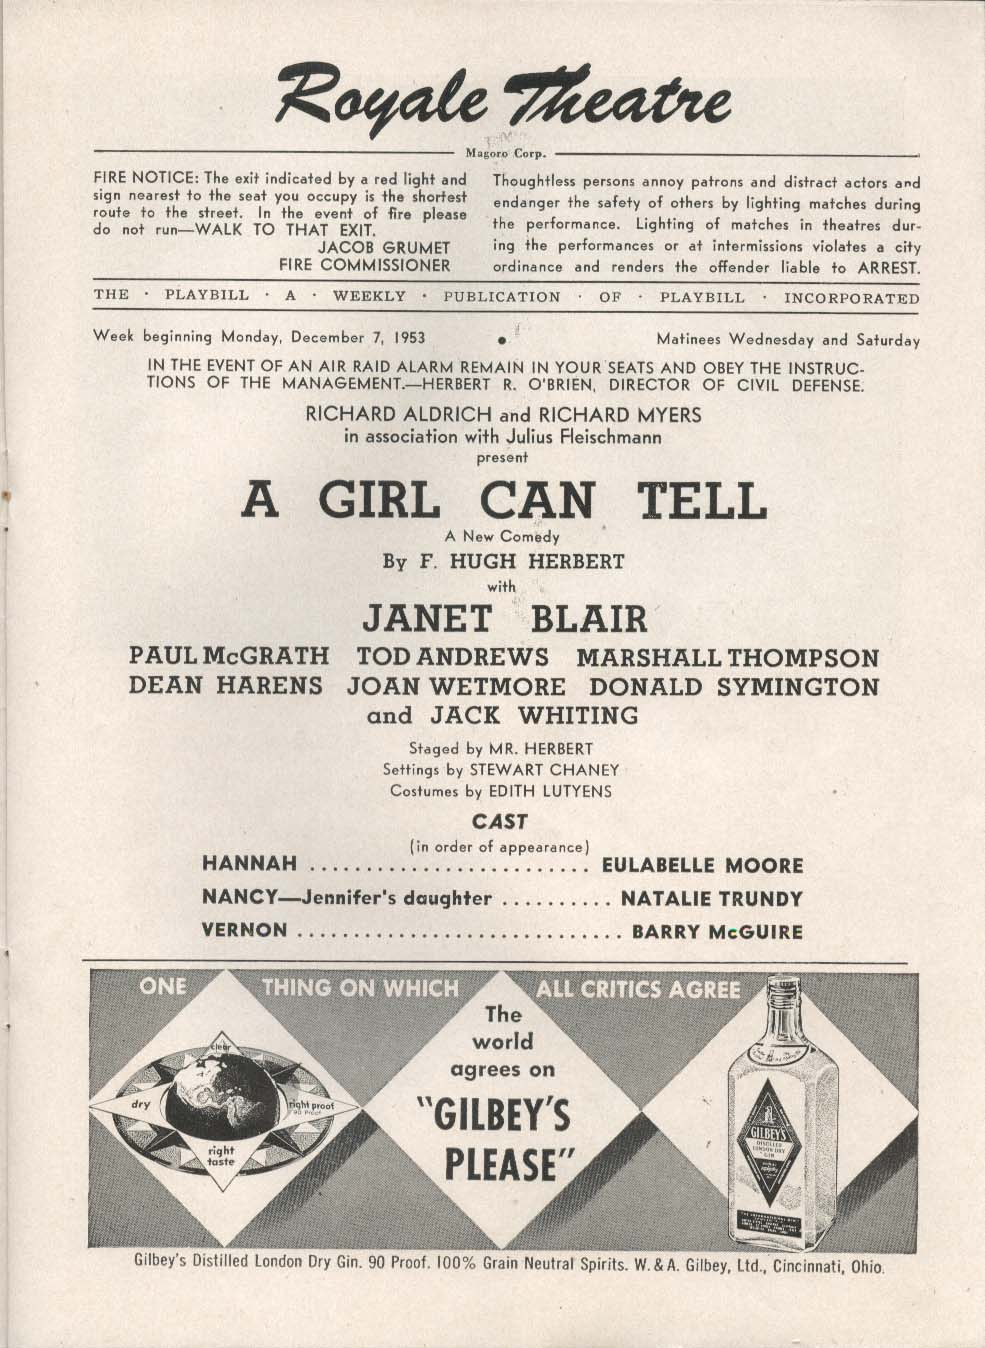 A Girl Can Tell Playbill 12/7/53 Janet Blair Paul McGrath Tod Andrews